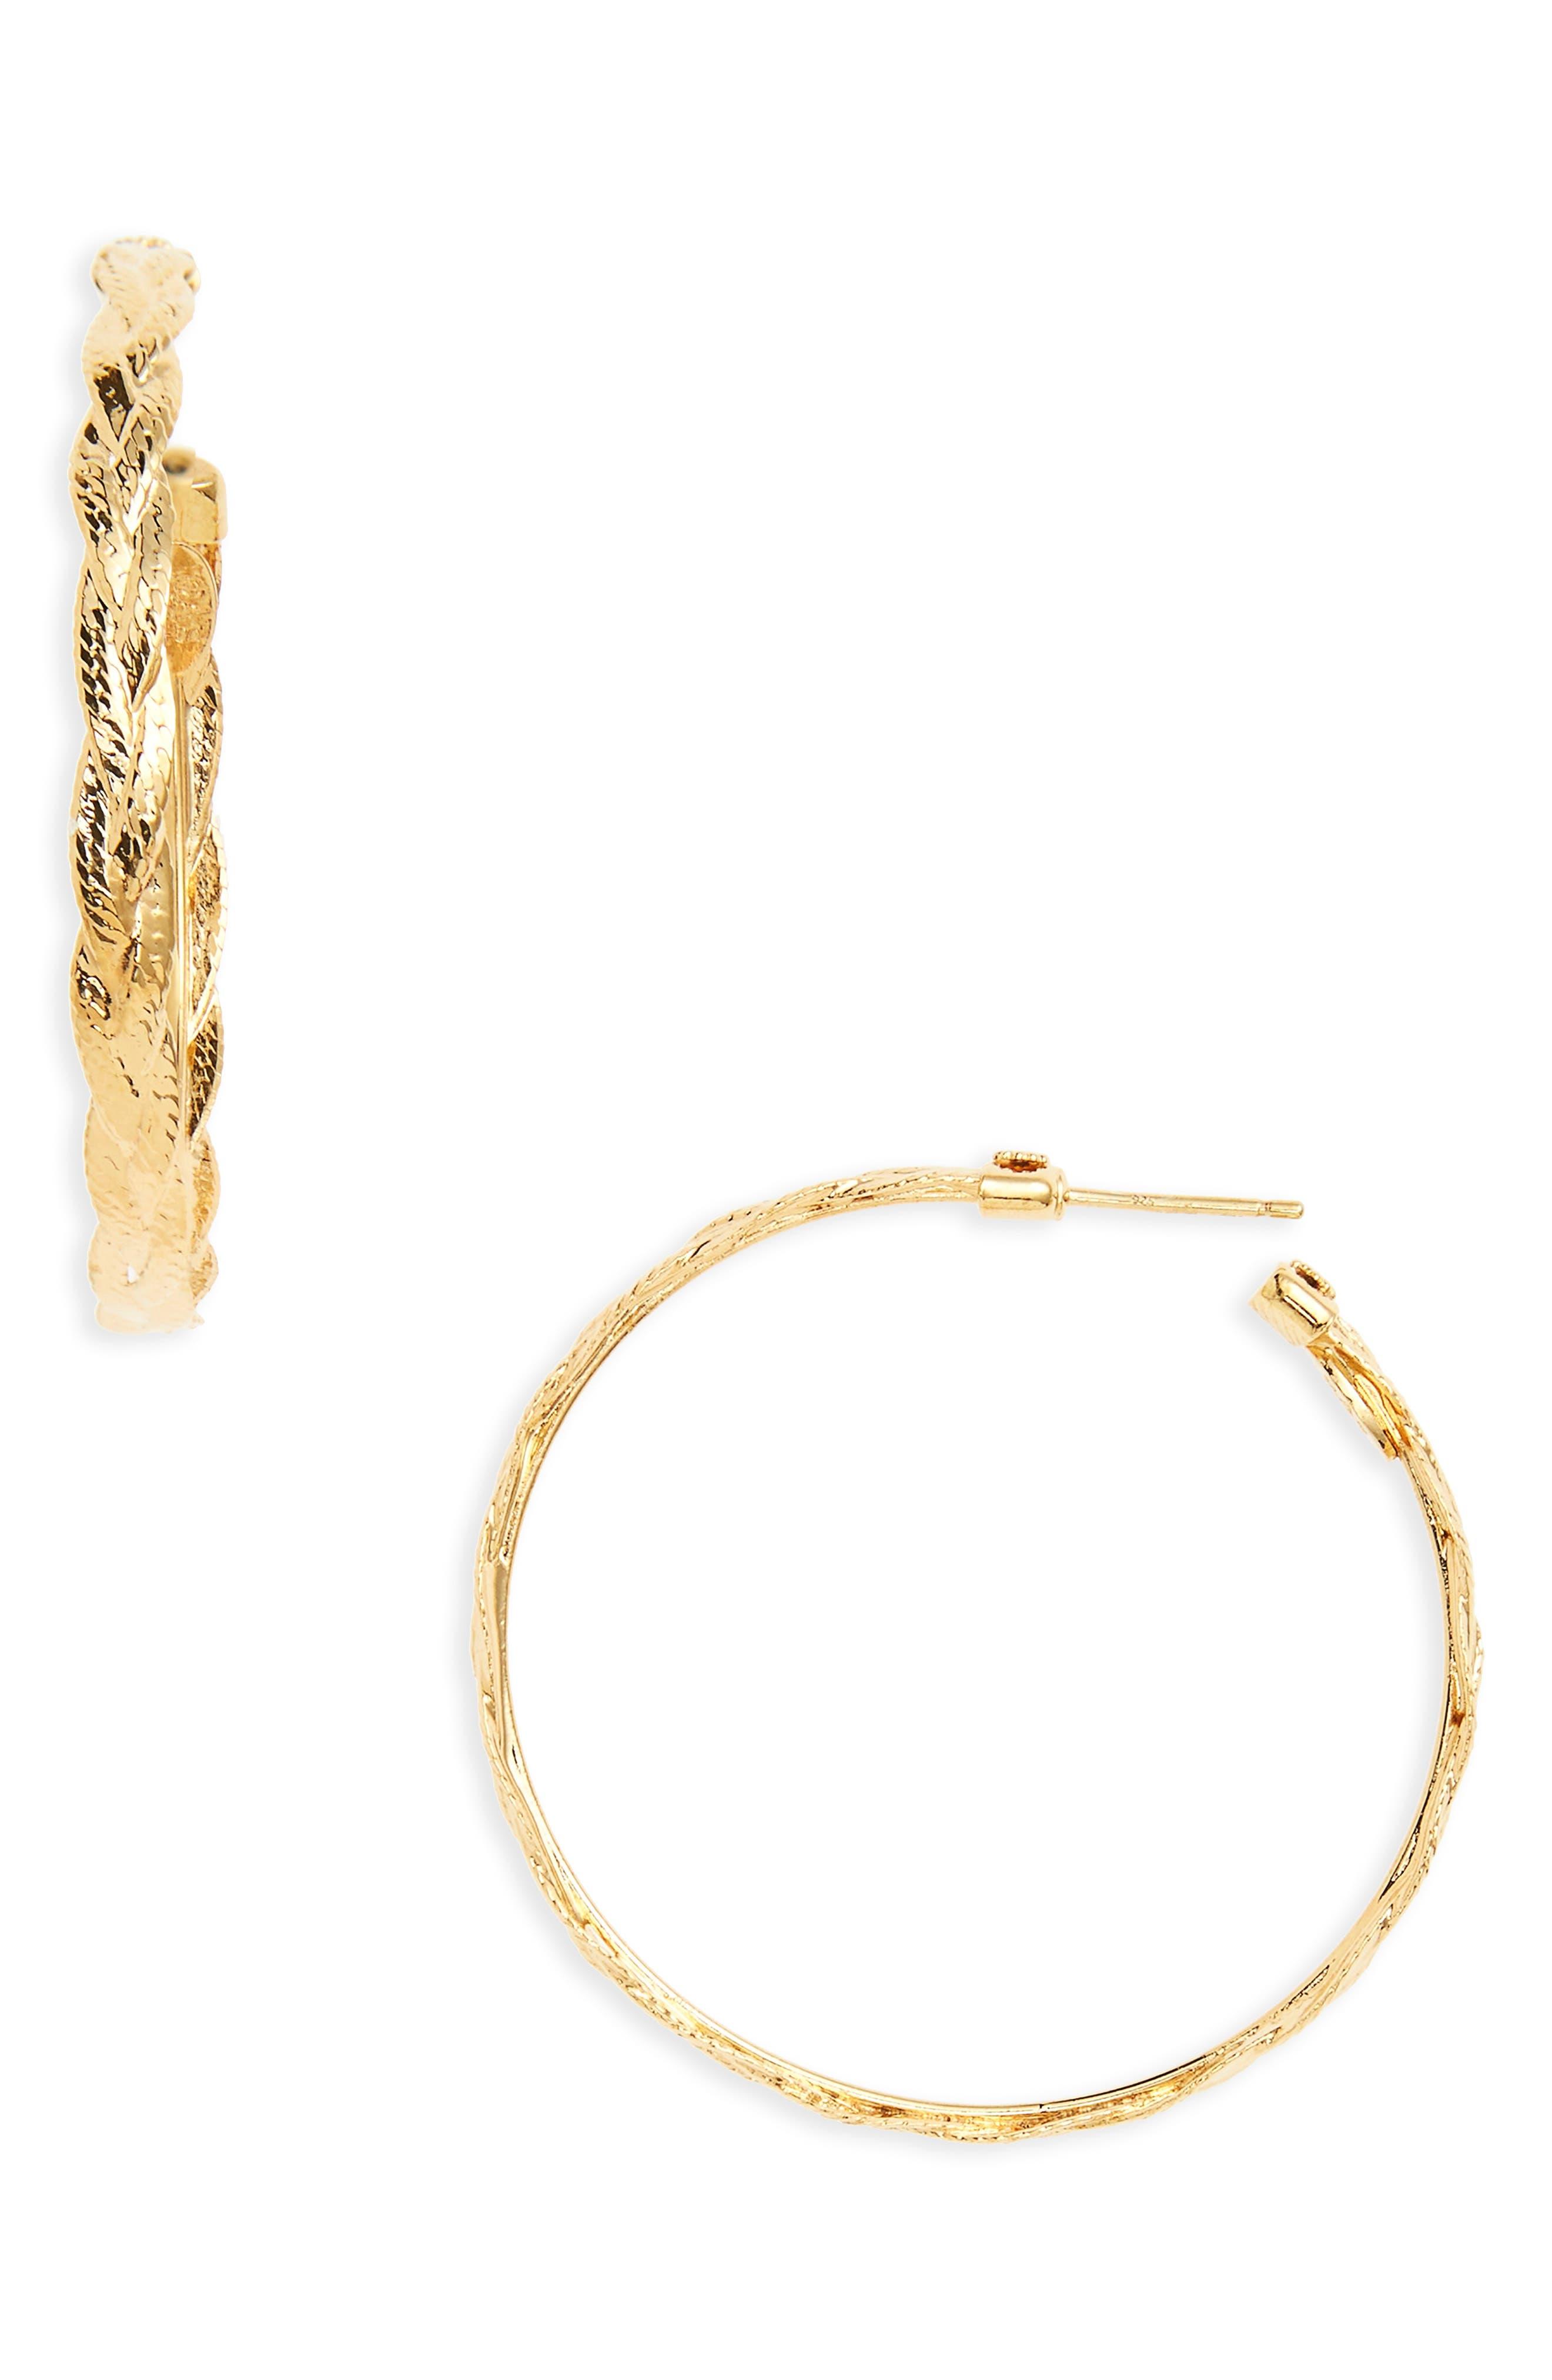 Medium Tresse Hoop Earrings,                         Main,                         color, Gold